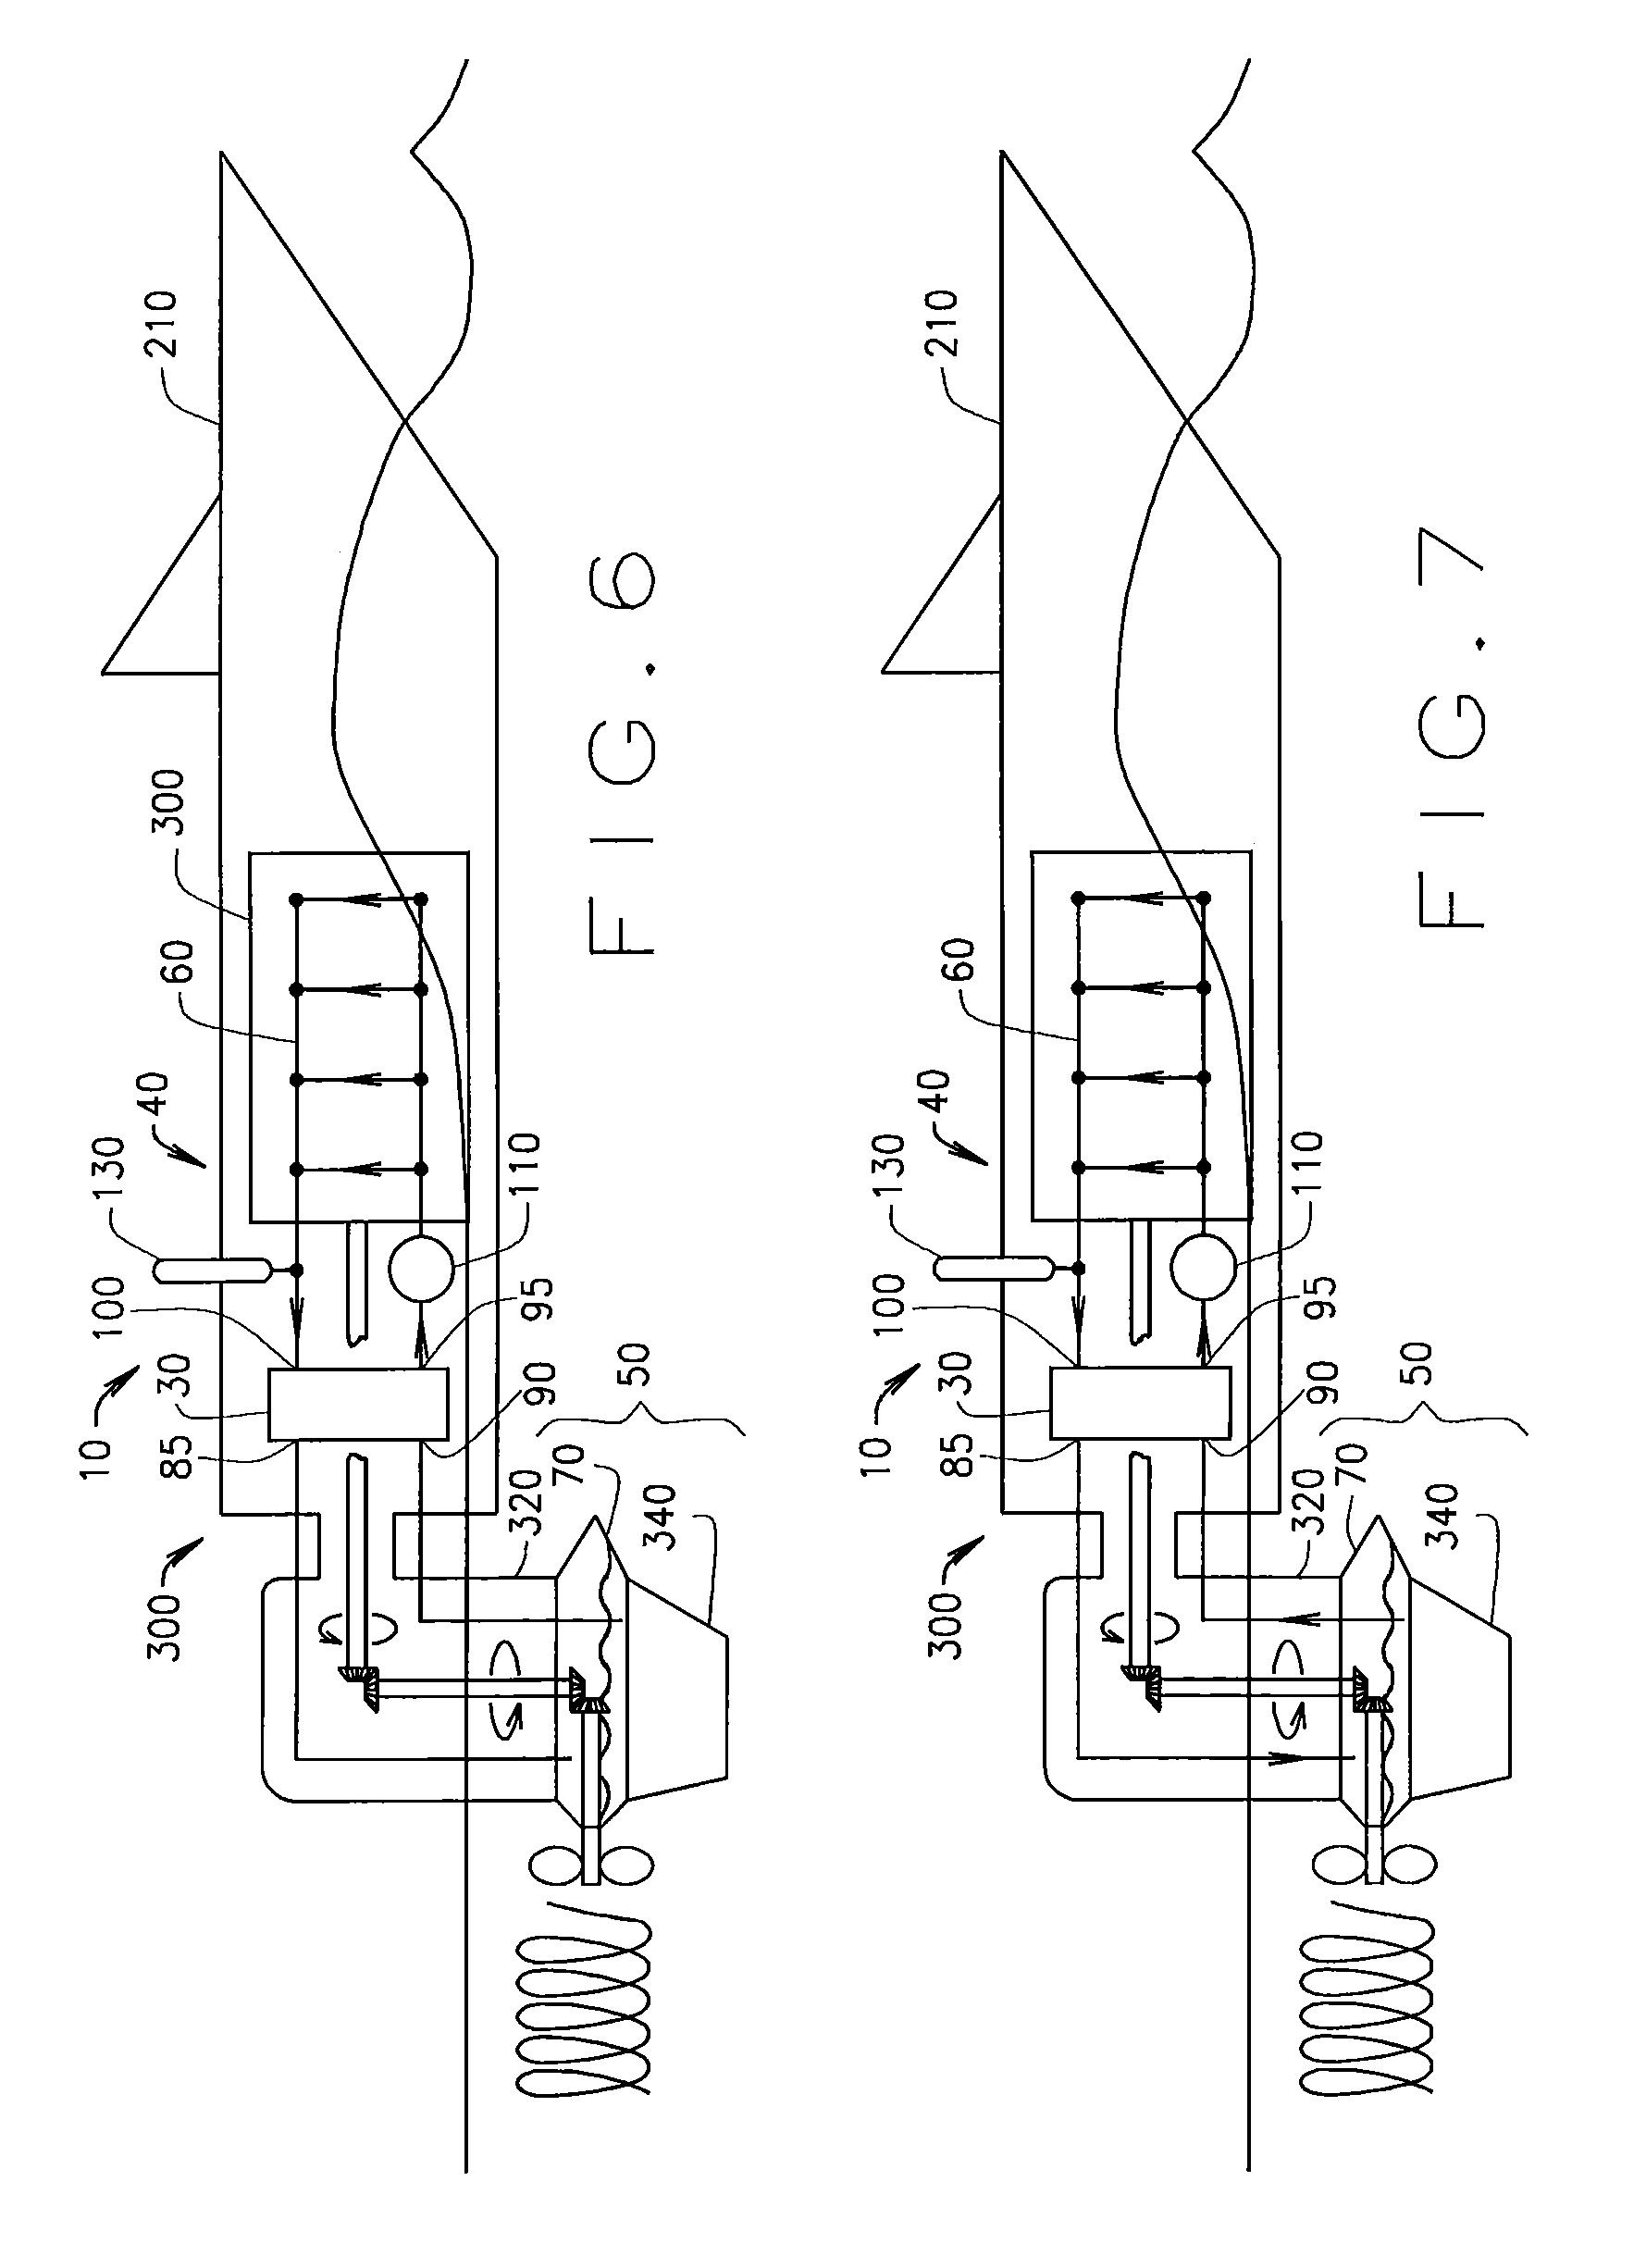 1966 Corvair Fuse Box Pontiac Fuse Box Wiring Diagram ~ ODICIS